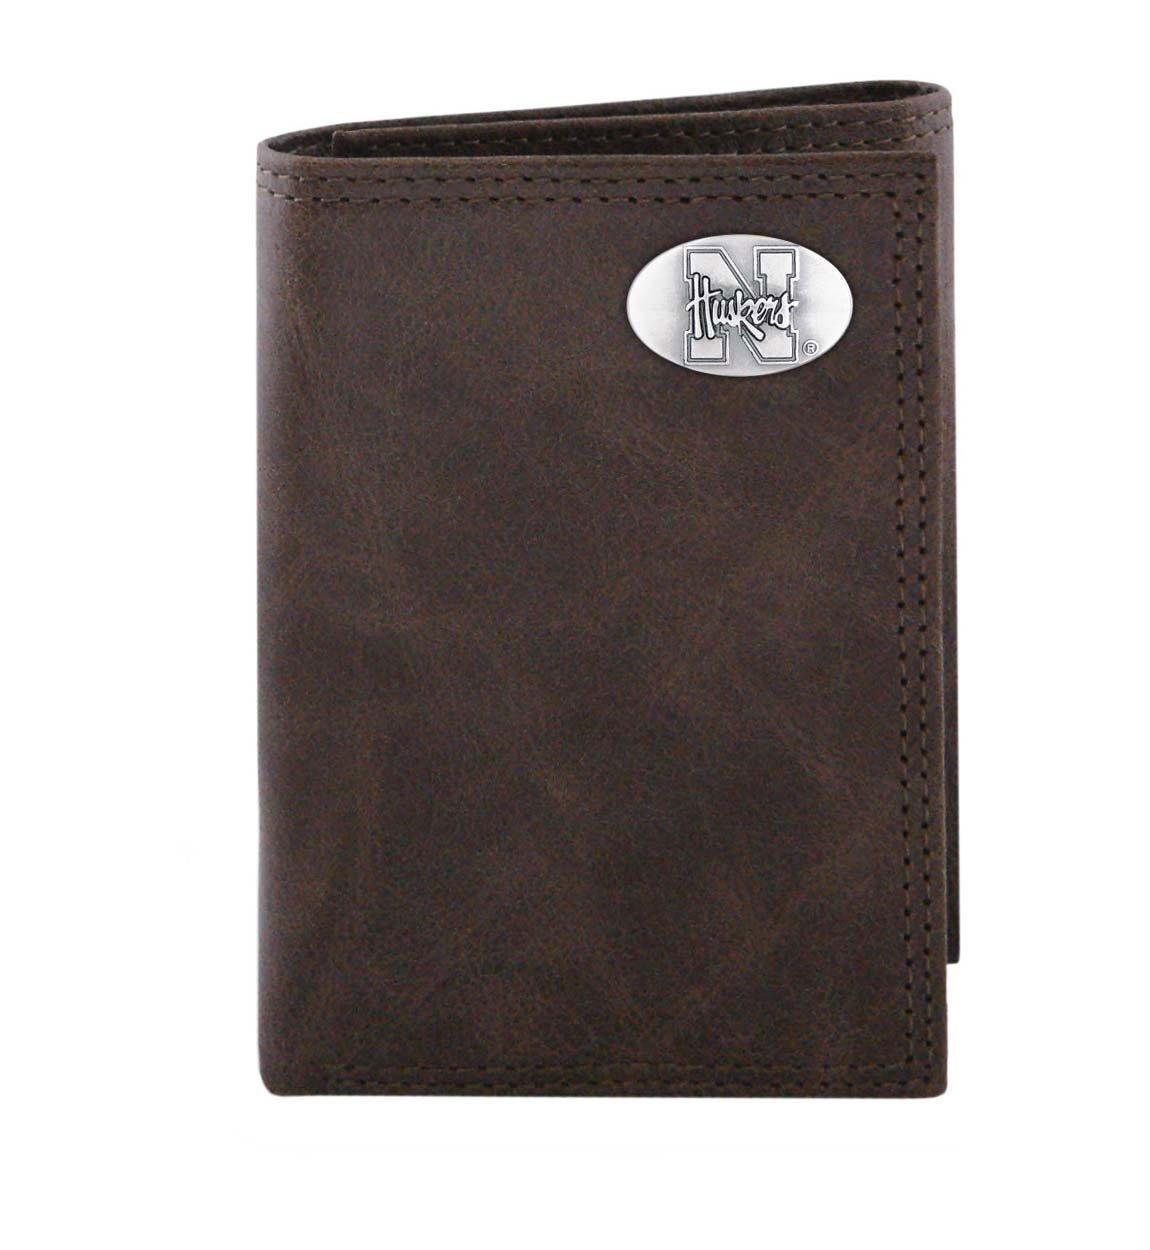 NCAA Nebraska Cornhuskers Brown Wrinkle Leather Trifold Concho Wallet, One Size